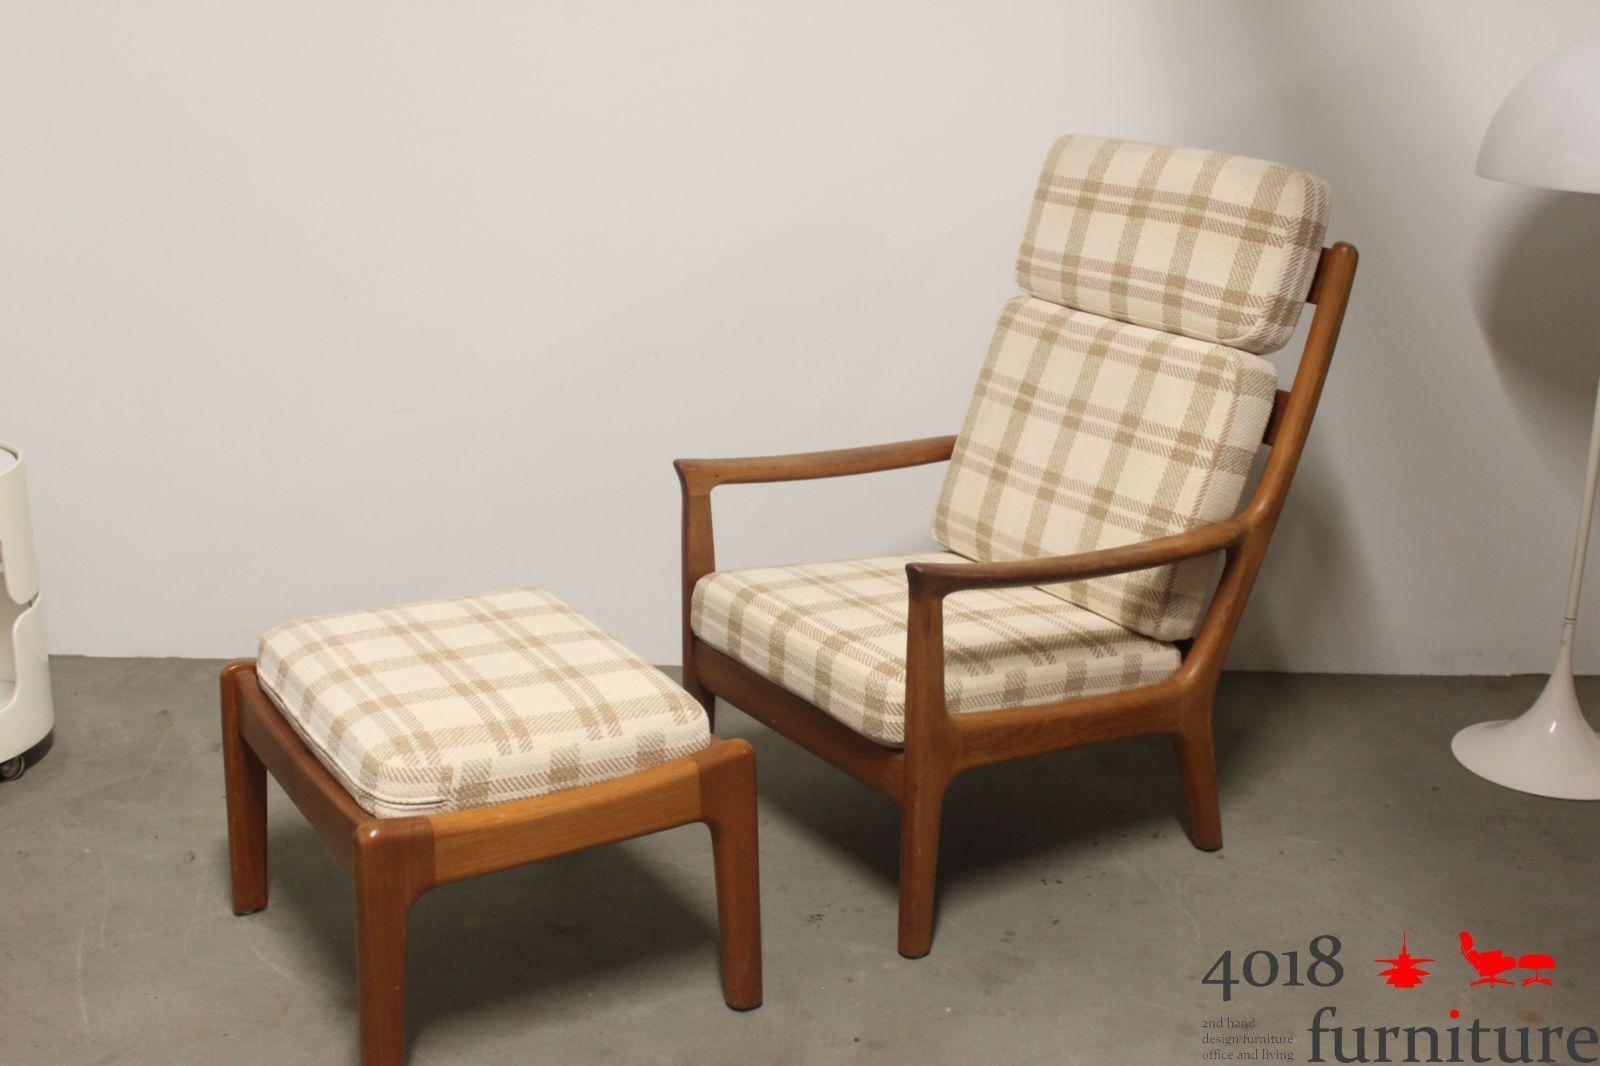 Sessel hocker: ssitg polyrattan gartenm bel lounge m bel